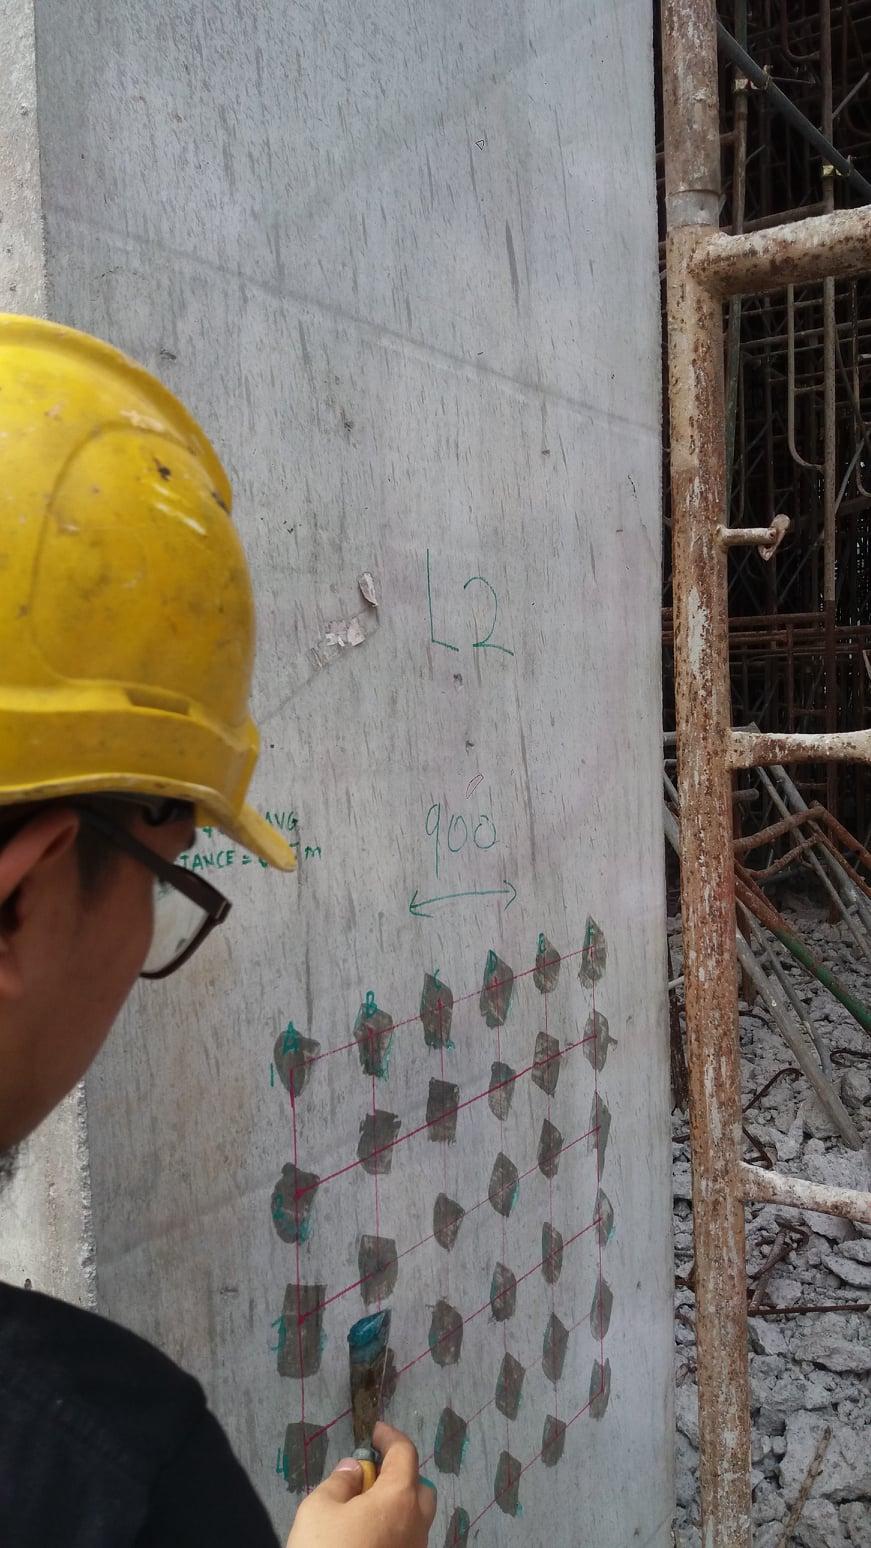 Sinctlab-We Care About Concrete- Home